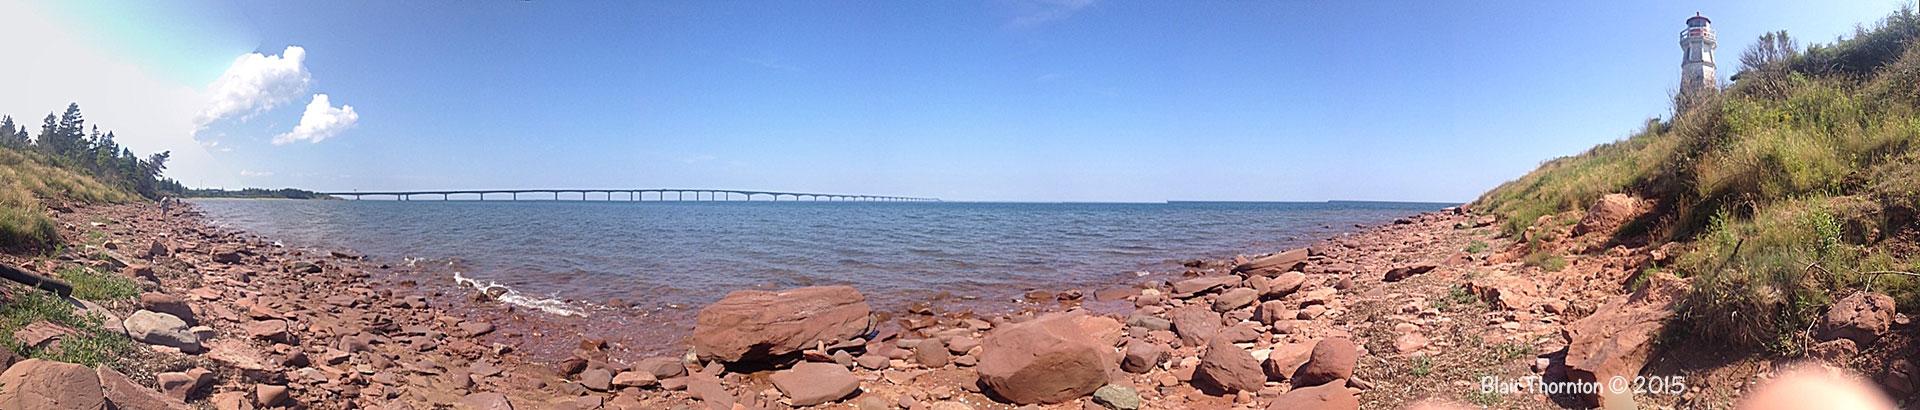 Cape-Jourimain Lighthouse and Confederation Bridge